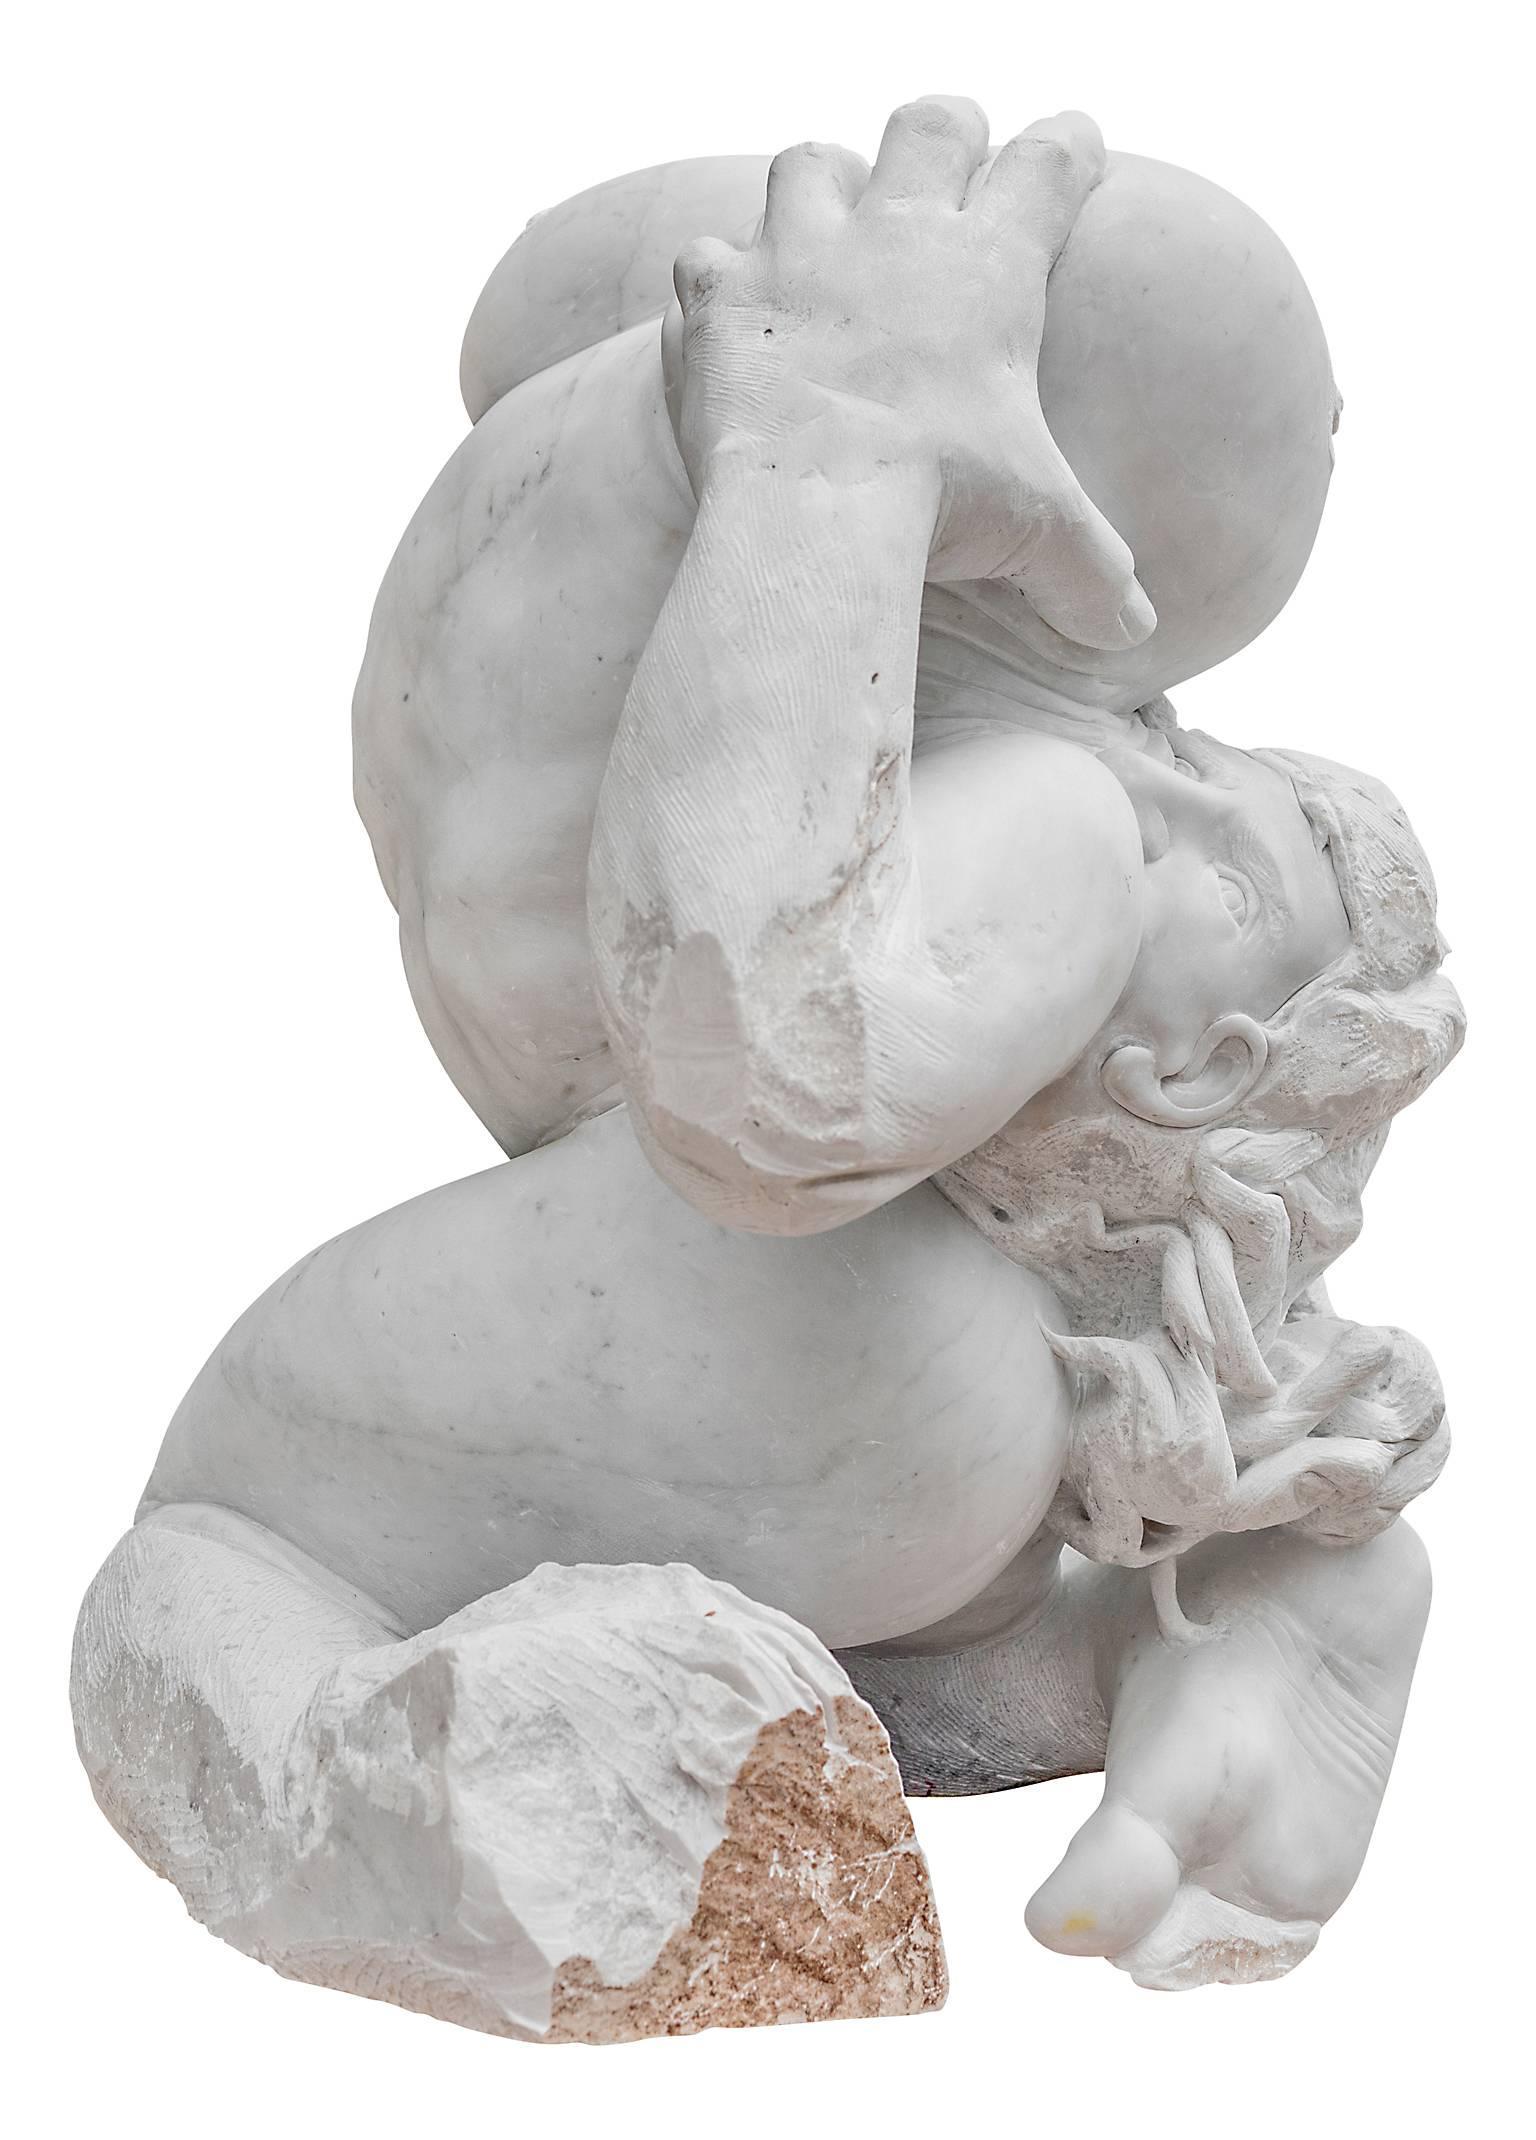 Madre Terra - hand carved figurative Carrara marble sculpture